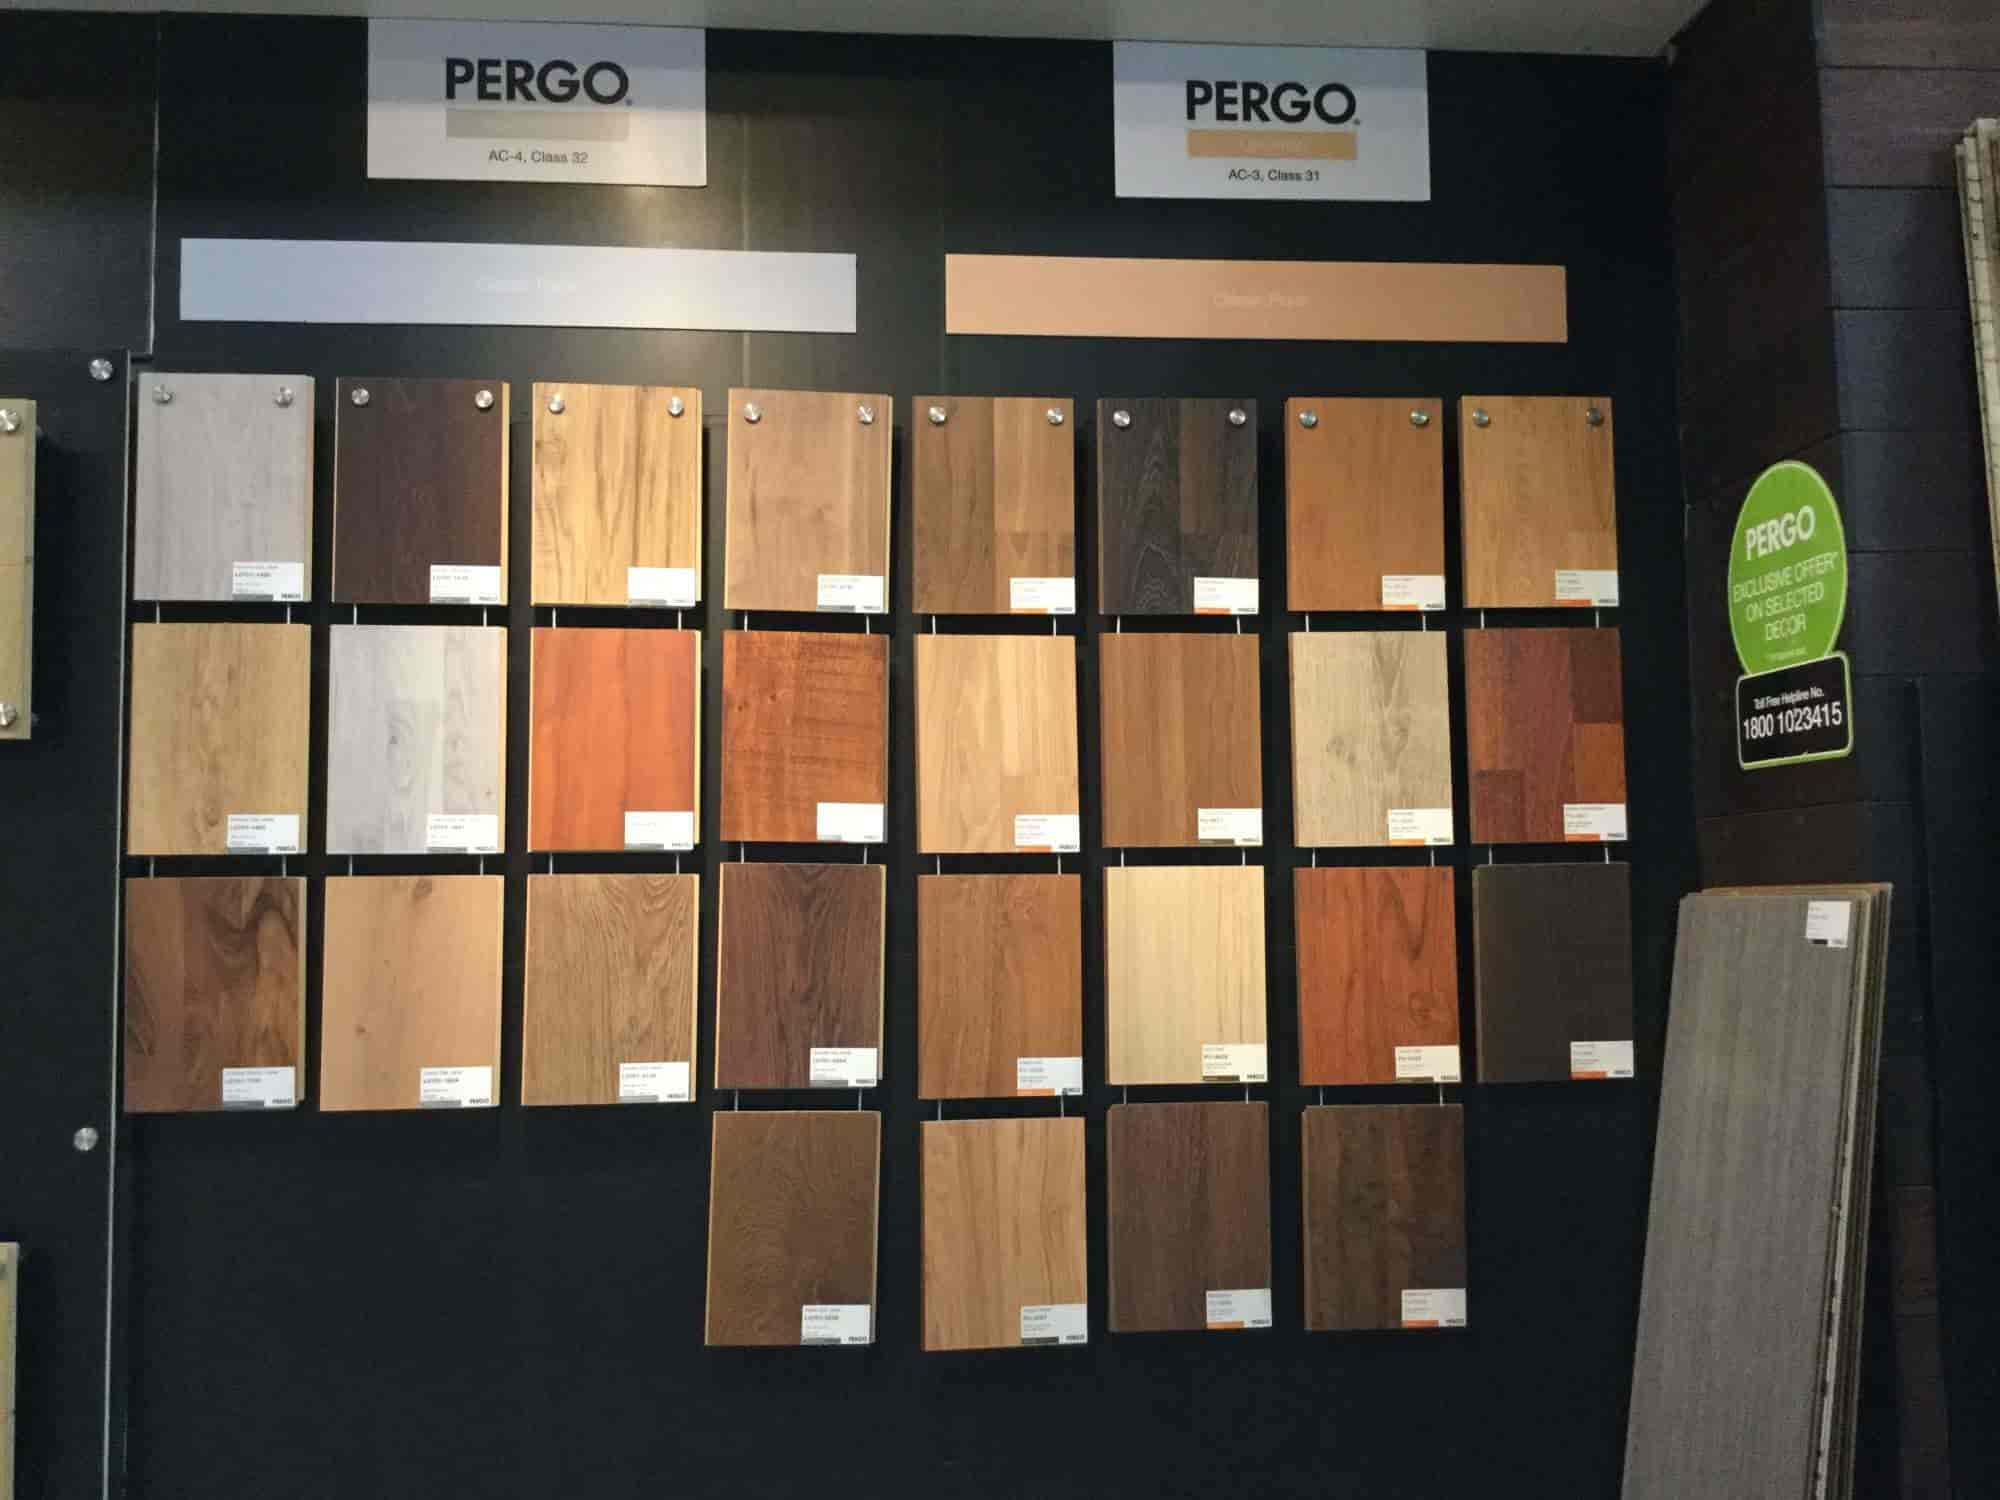 Pergo India Pvt Ltd Mg Road Wooden Flooring Manufacturers In Delhi Justdial